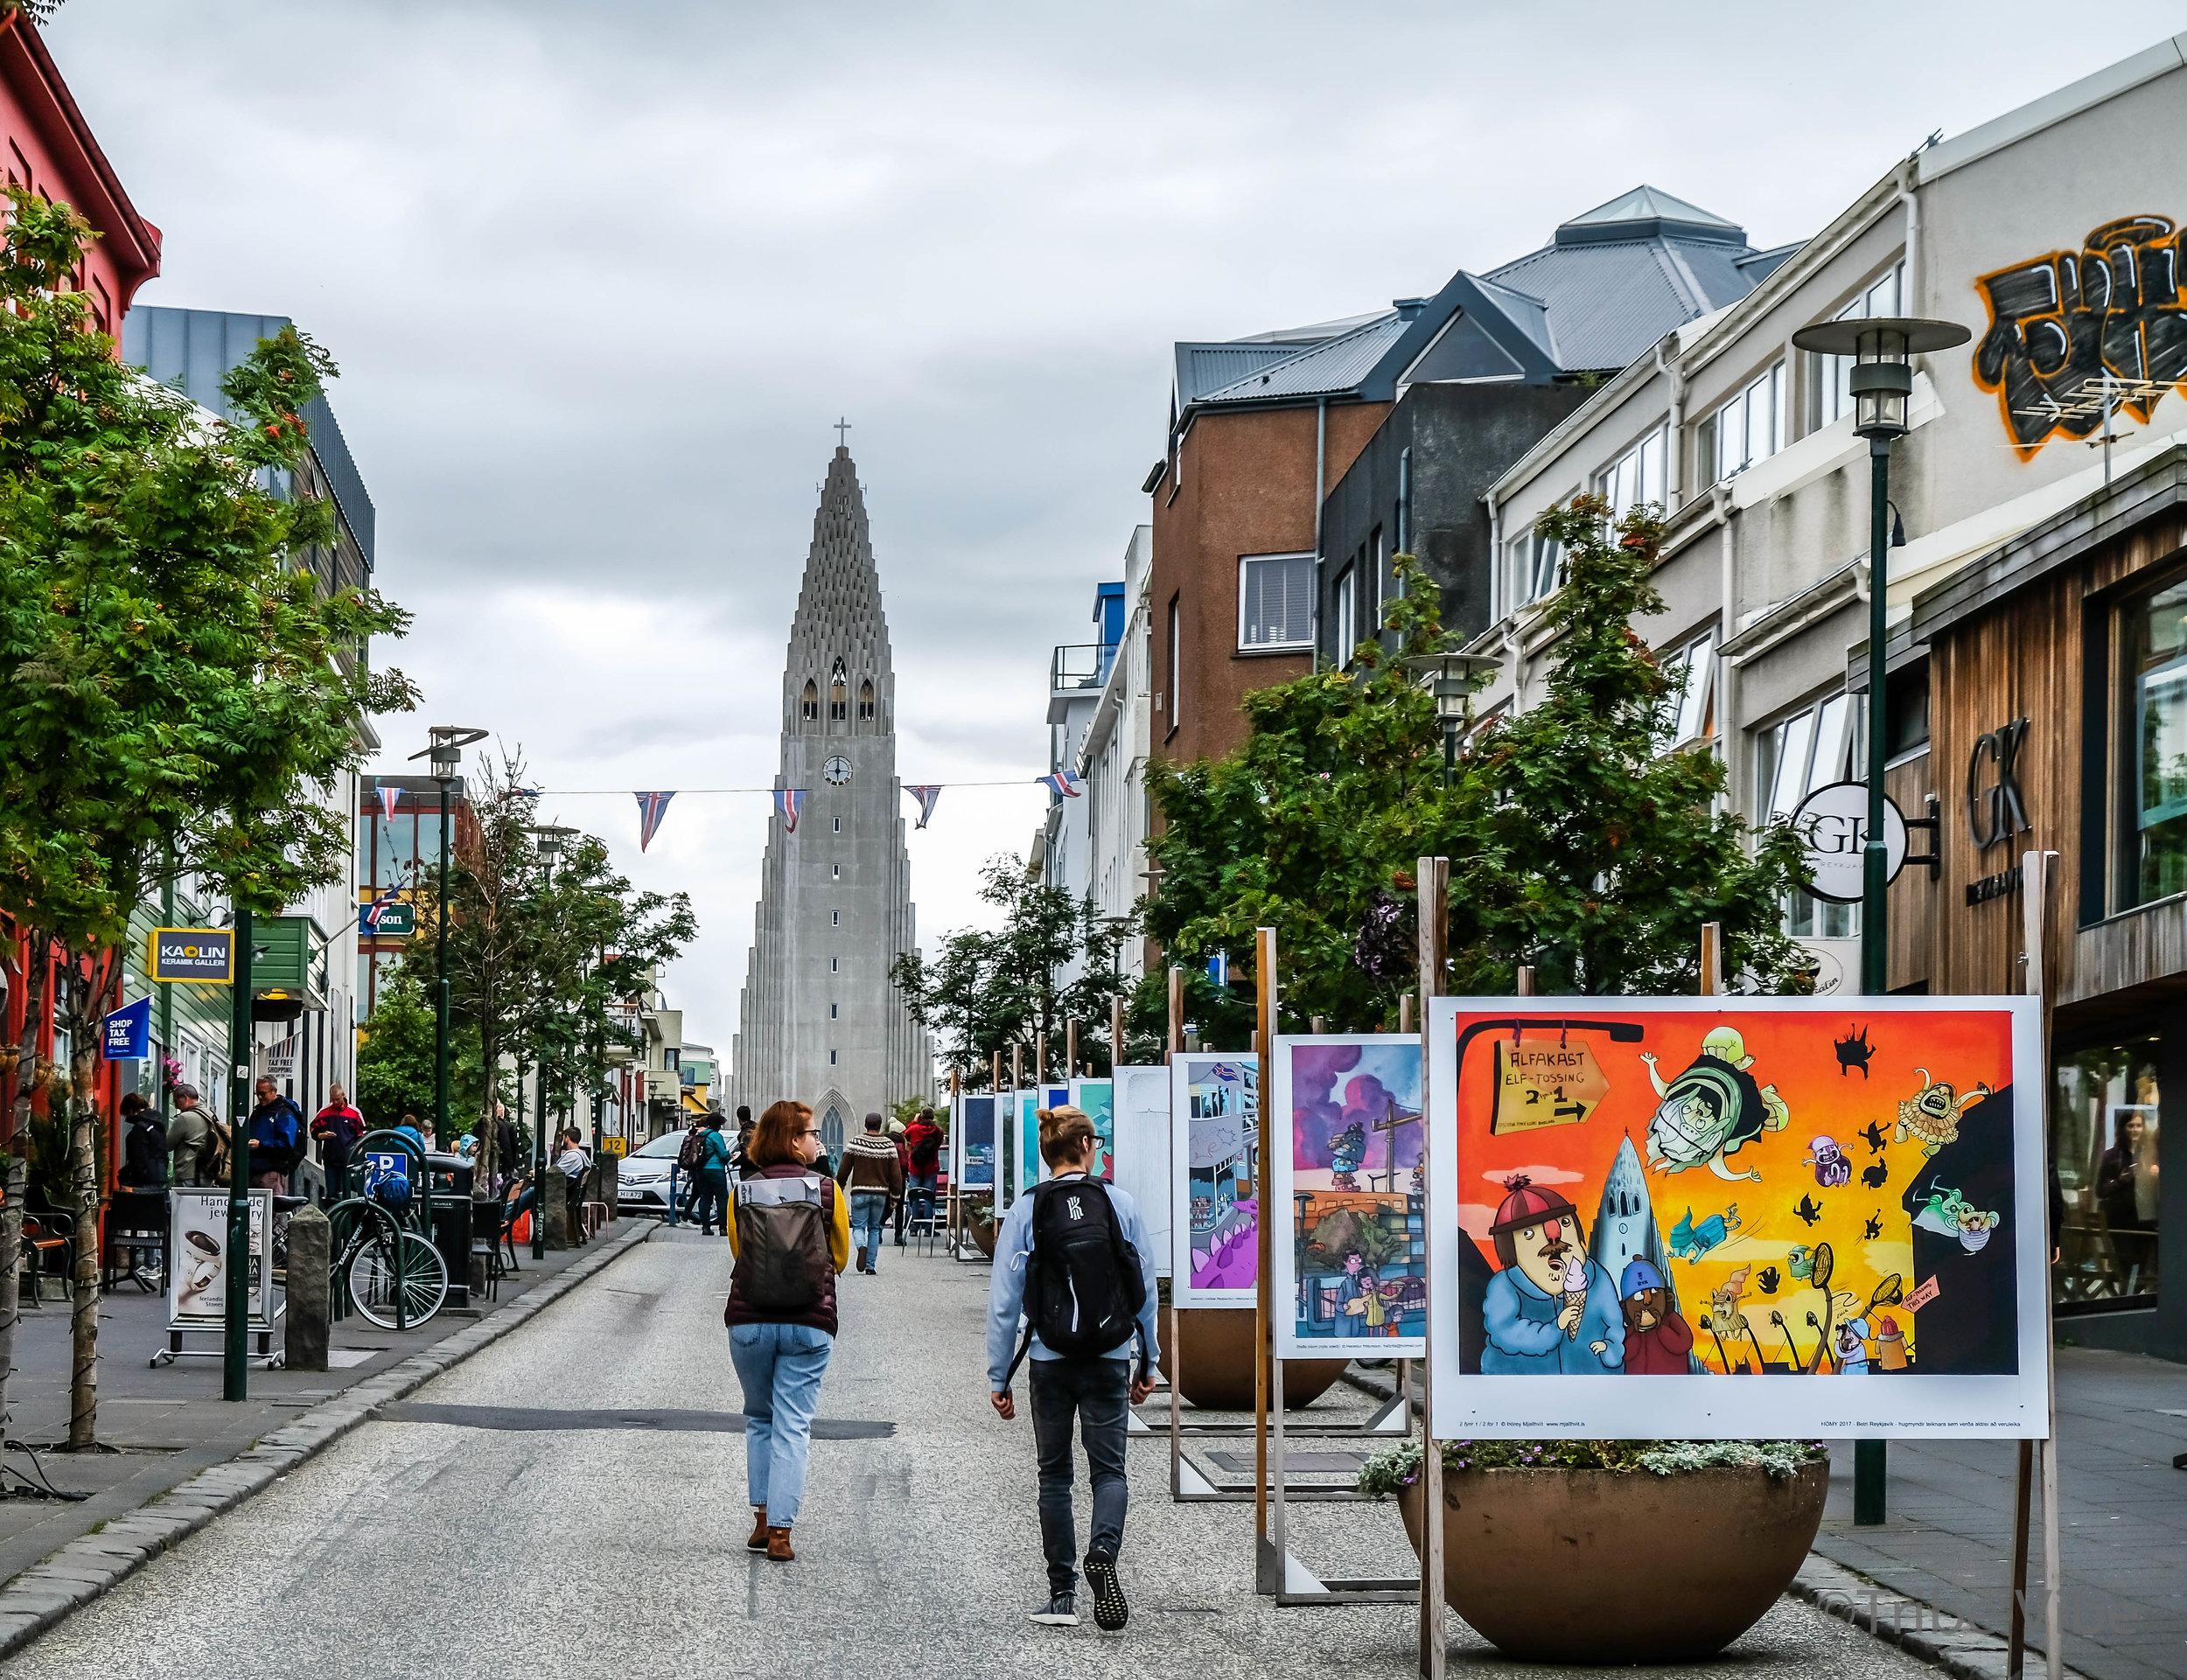 City centre in Reykjavik